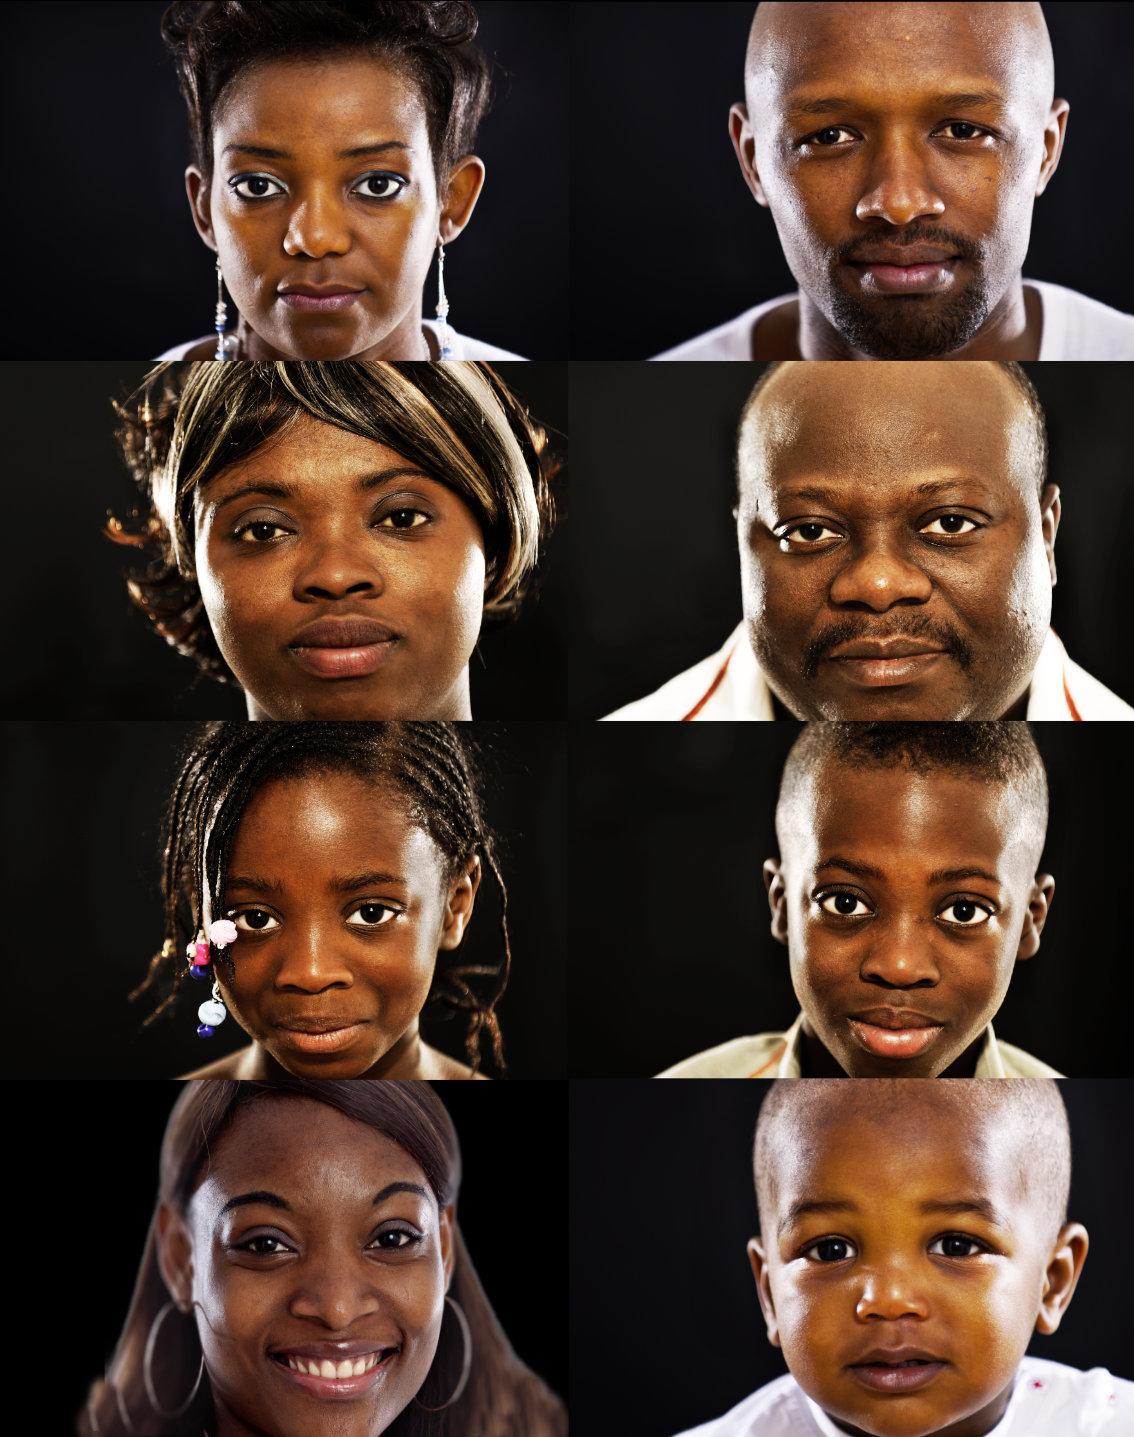 Portraits Headshoots Fotograf Lothar Drechsel Mönchengladbach